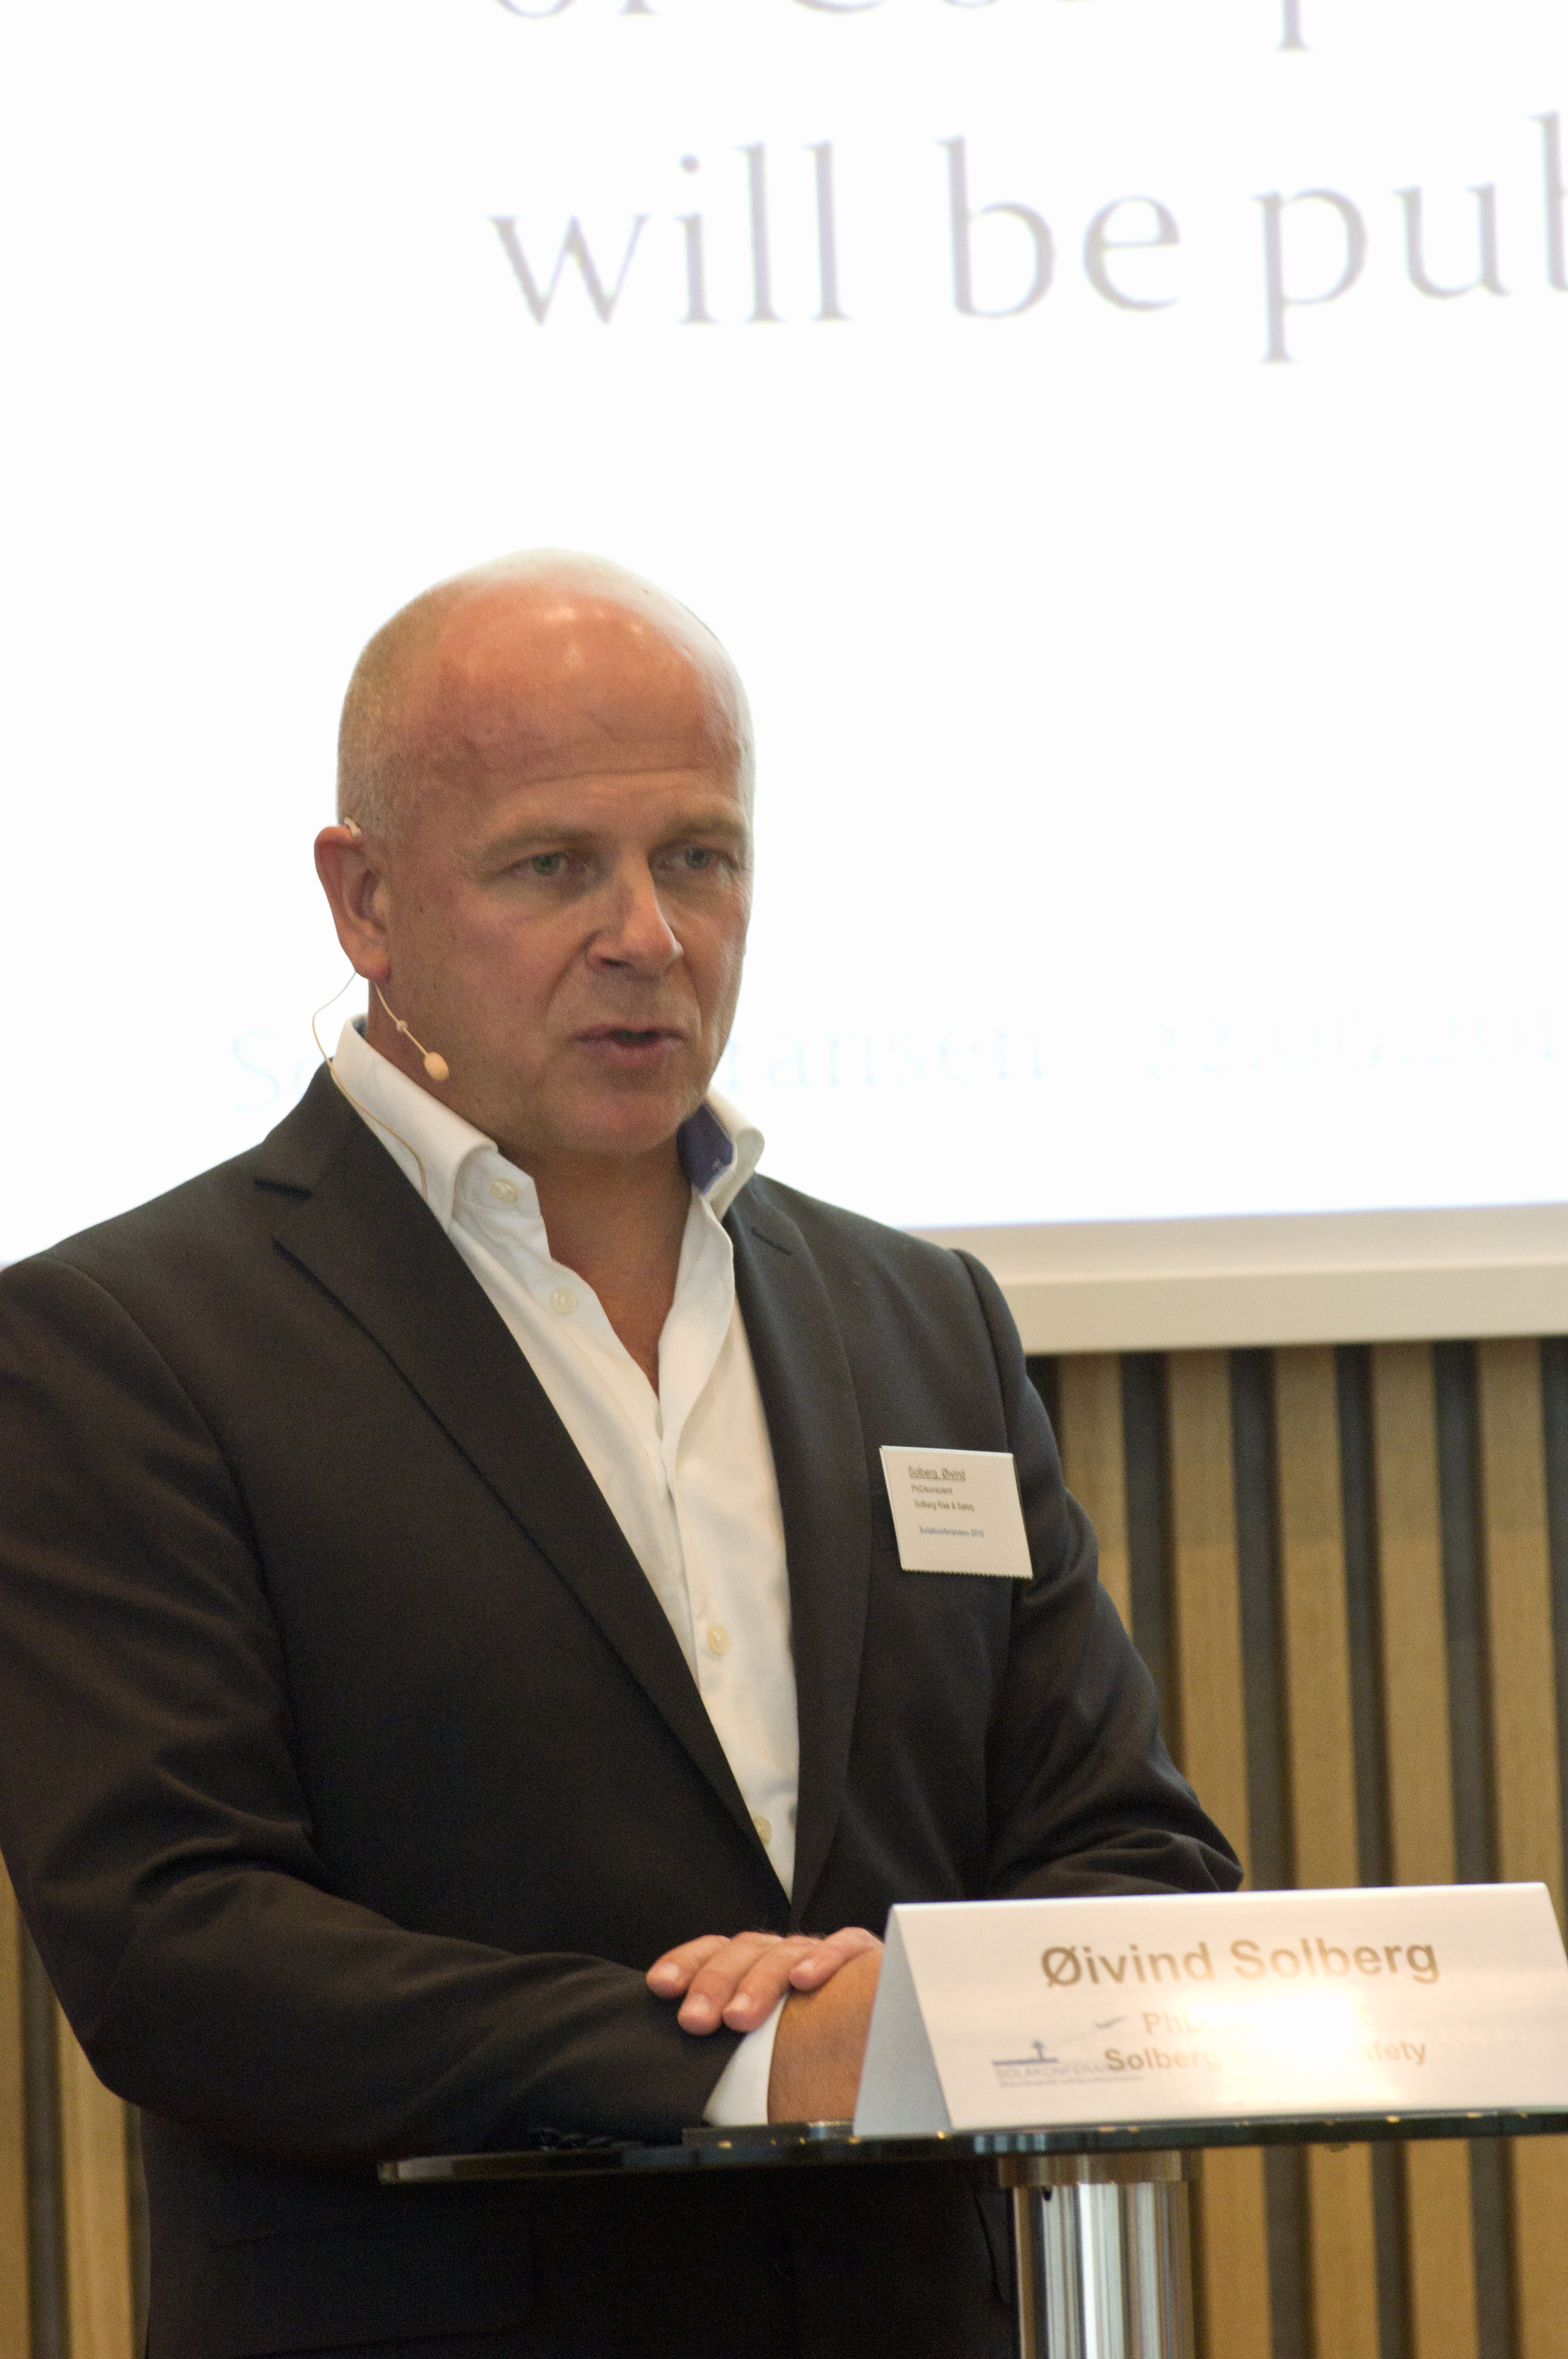 Øivind Solberg (2).JPG